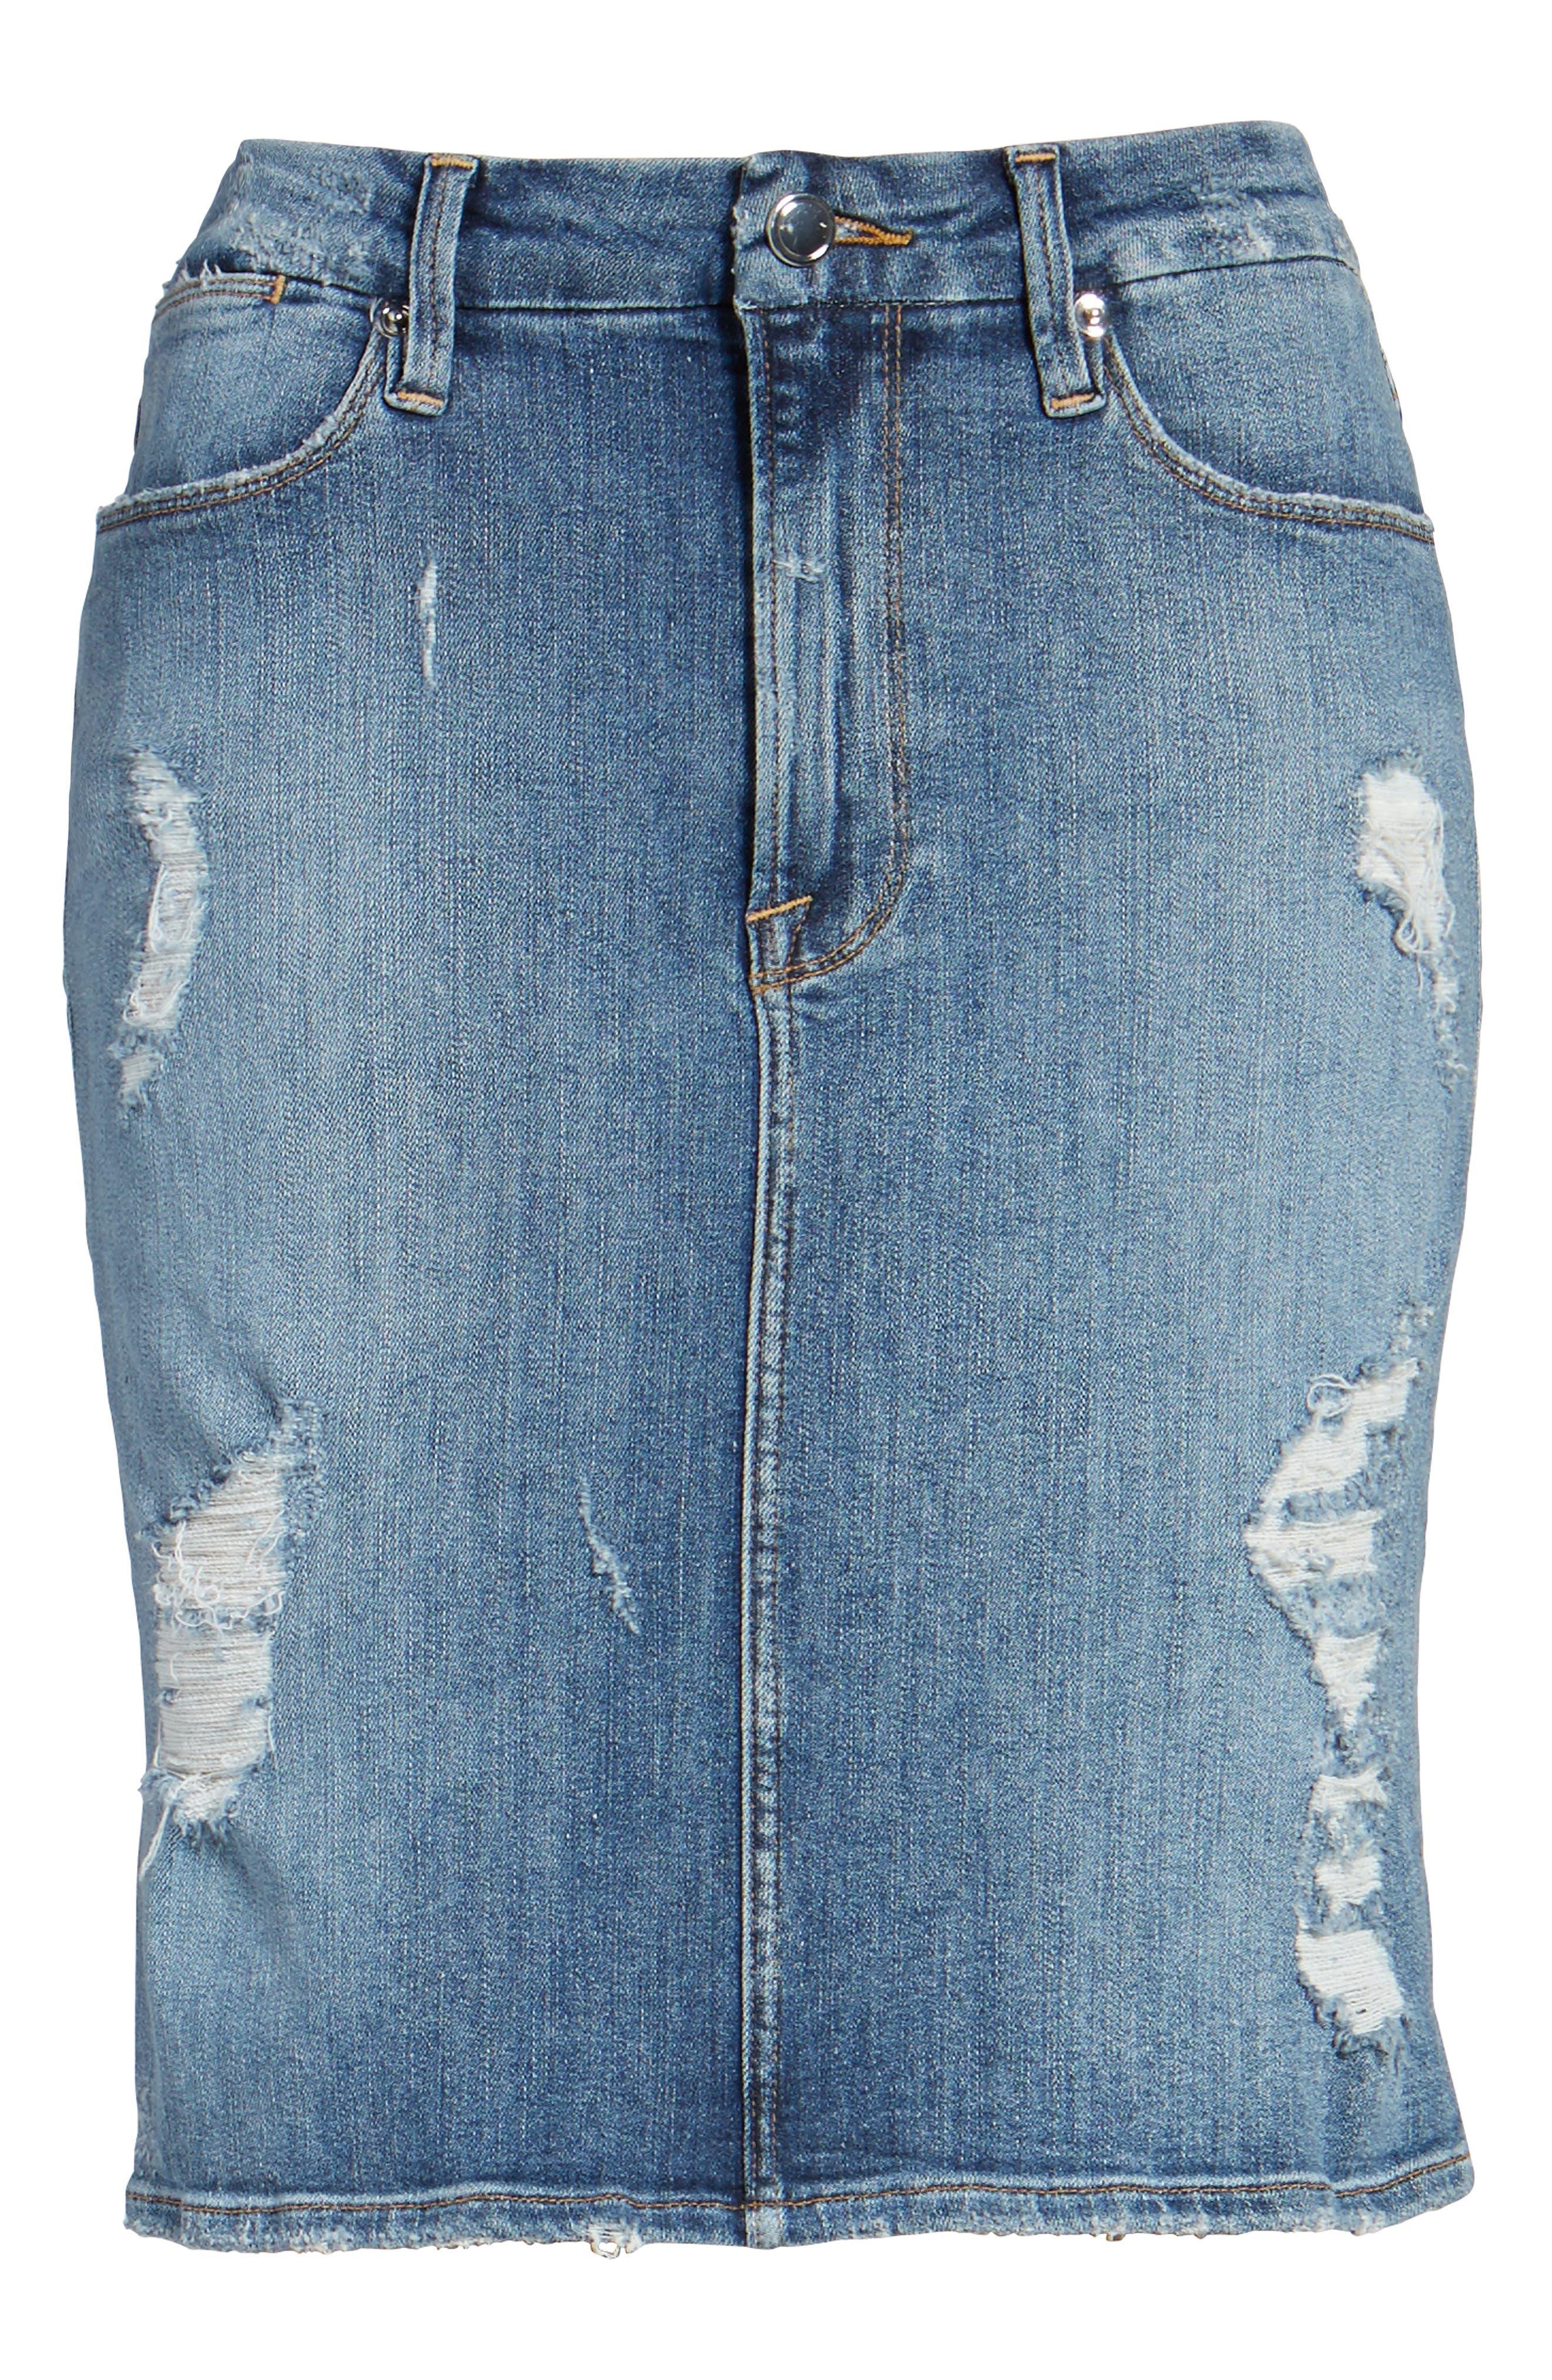 High Waist Denim Pencil Skirt,                             Alternate thumbnail 7, color,                             Blue 083